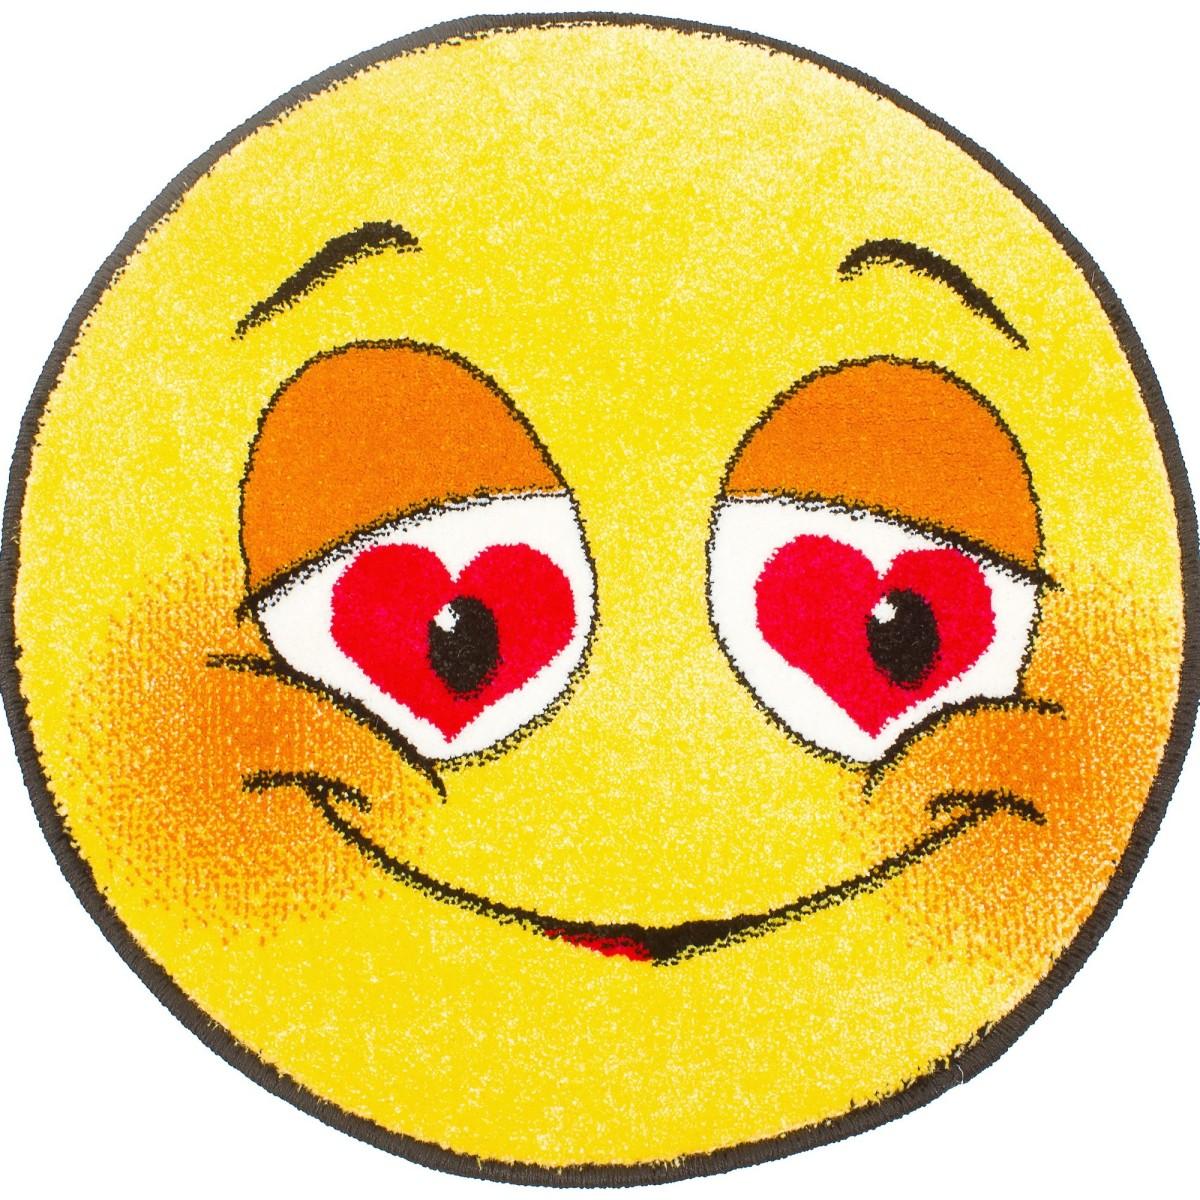 Ковер  Smiles диаметр 067 м полипропилен